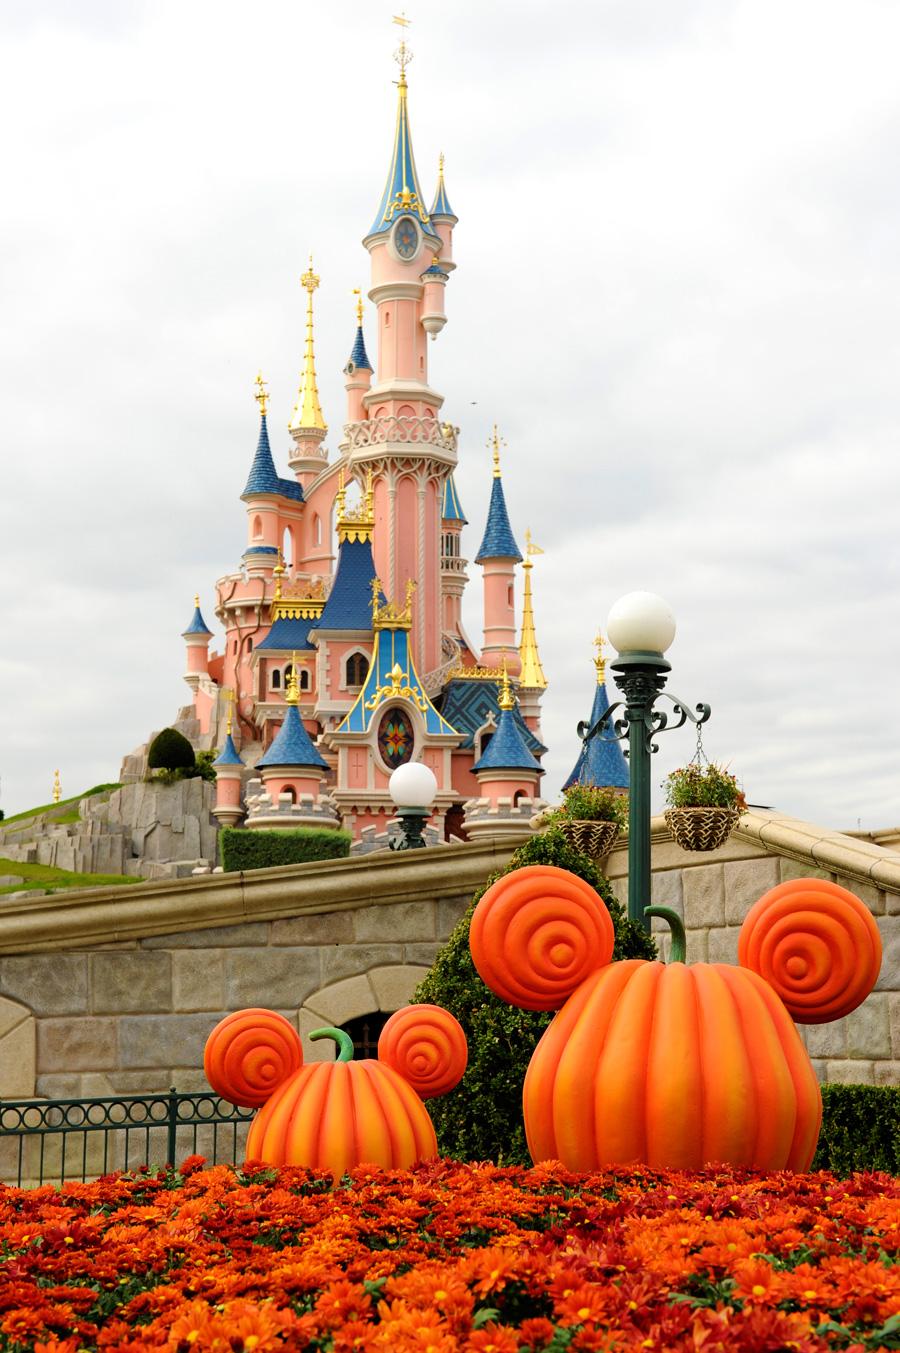 Fall Wallpaper With Pumpkins Disney S Halloween Festival In Paris Disney Parks Blog